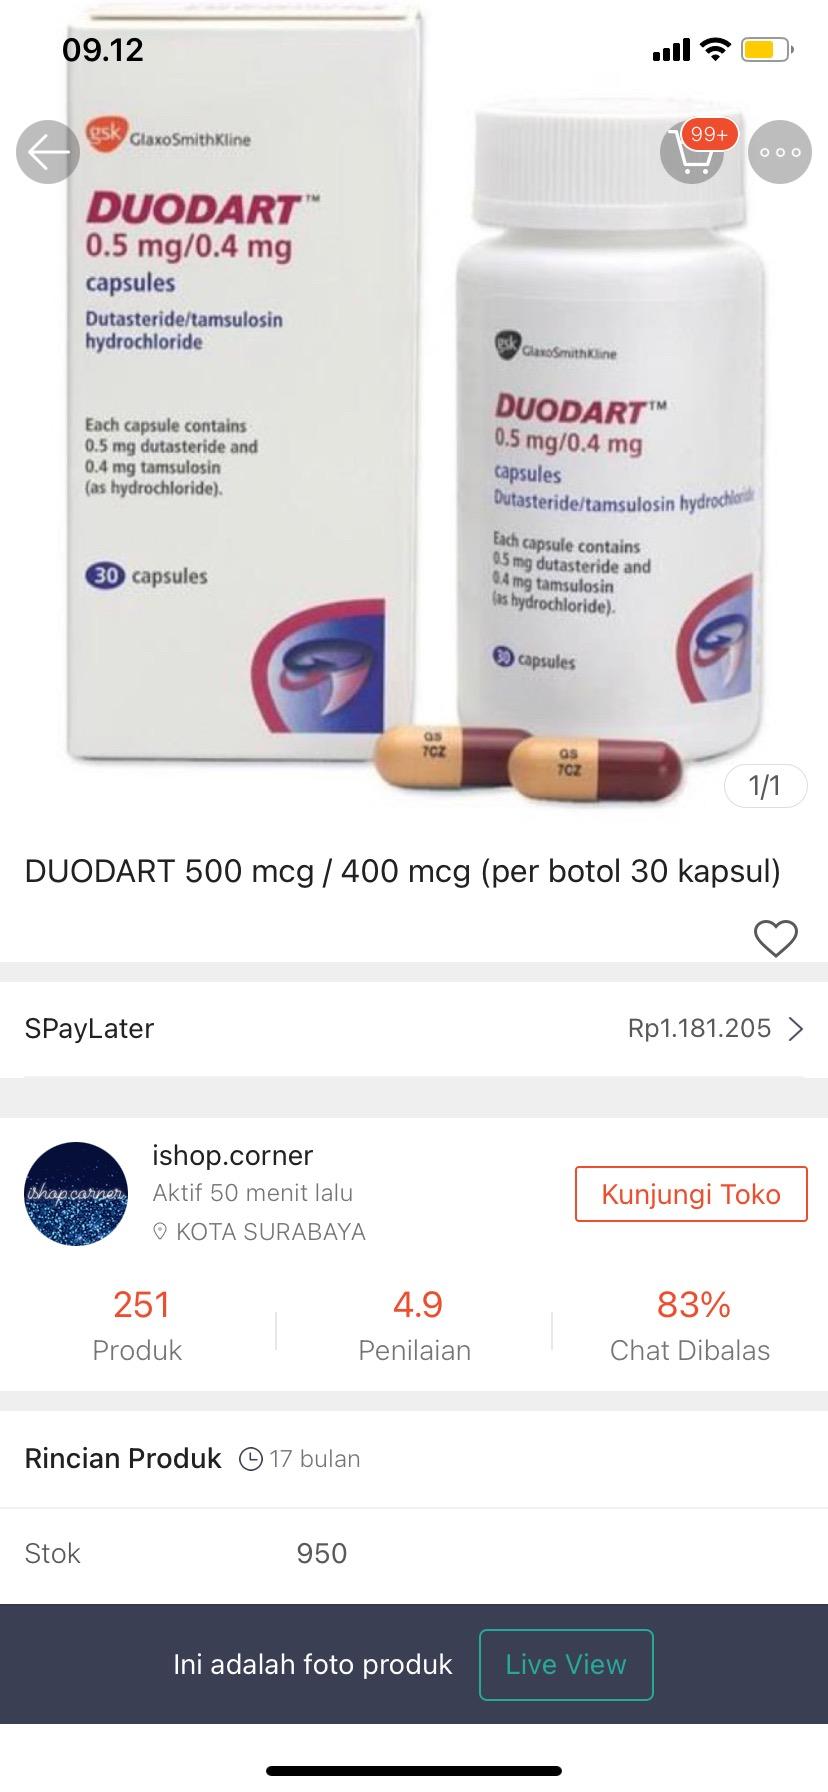 Duodart 500 Mcg 400 Mcg Per Botol 30 Kapsul Shopee Indonesia